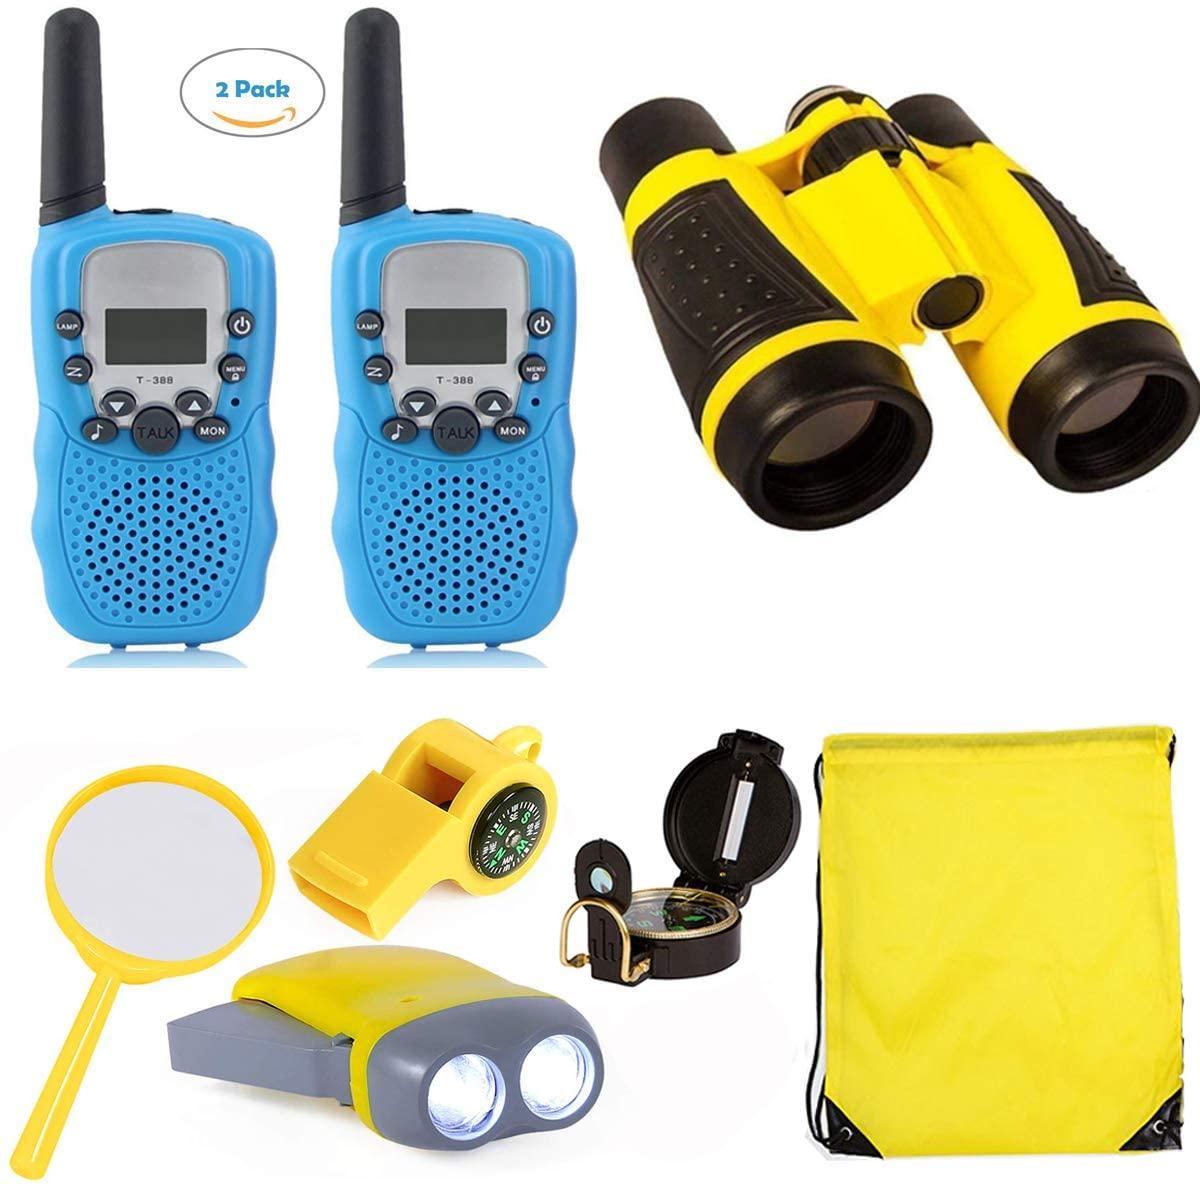 Woltechz Explorer Kit for Kids 2packs Walkie Talkies with 3KM Long Rang/Binoculars for Kids/Flashlight/Compass Adventure Kit for Kids Gift for Camping, Hiking, STEM Toys